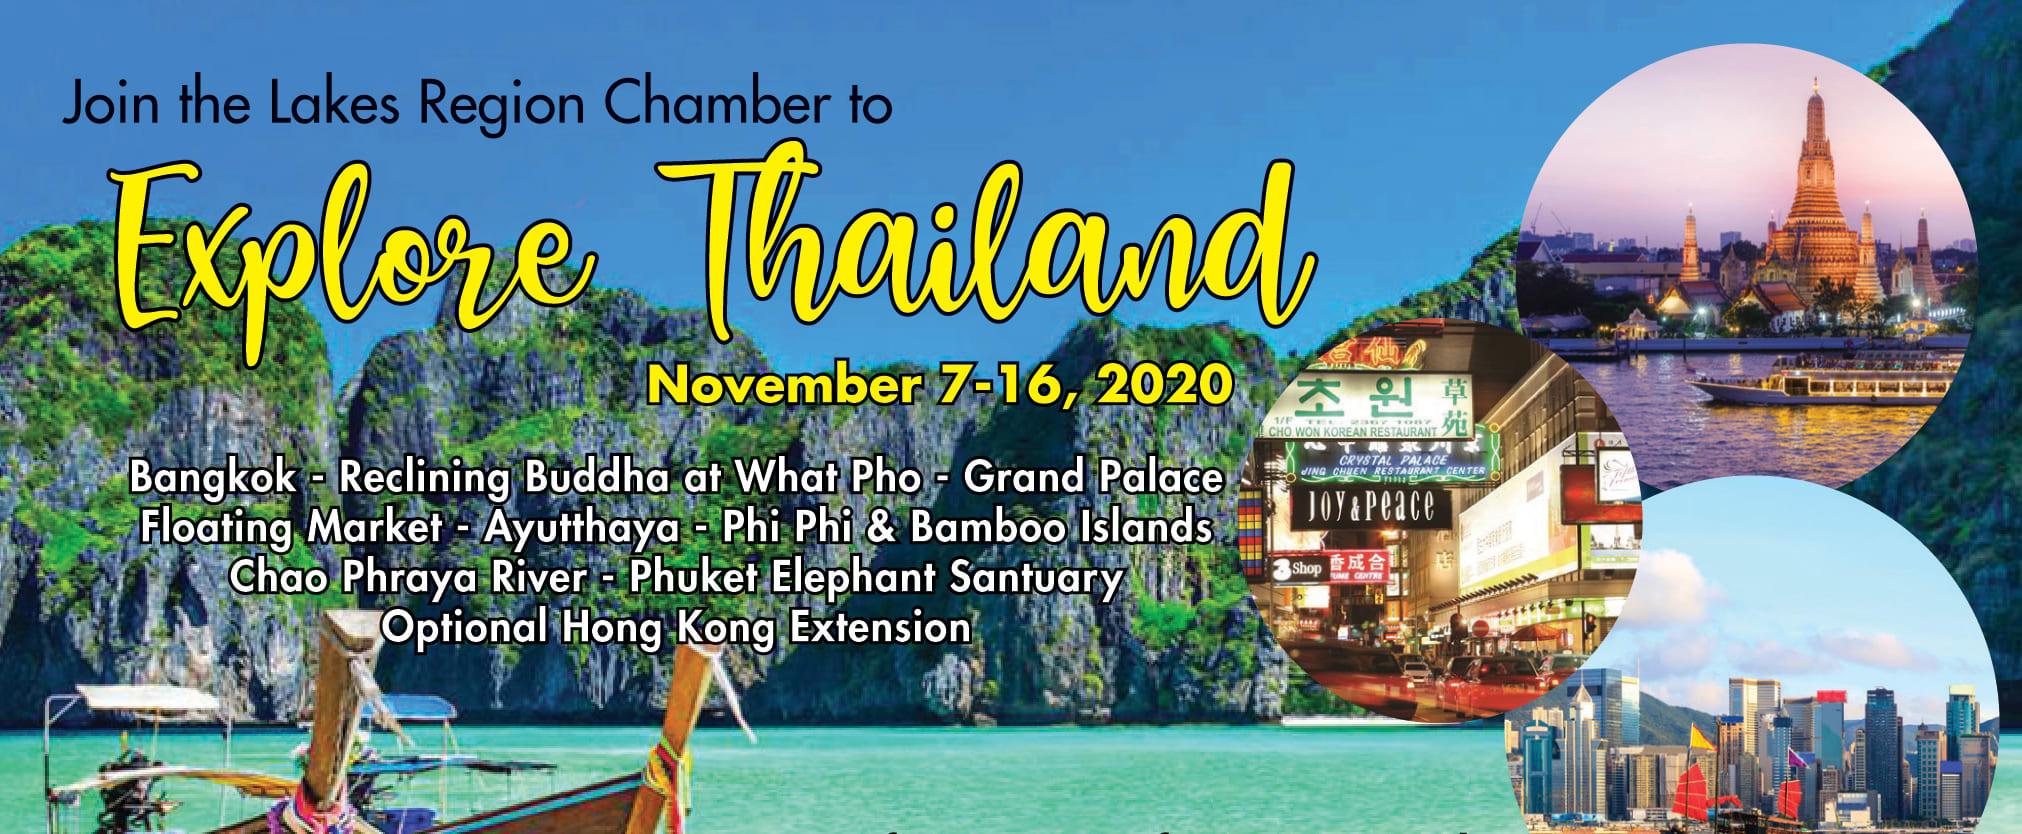 Thailand2020.jpg